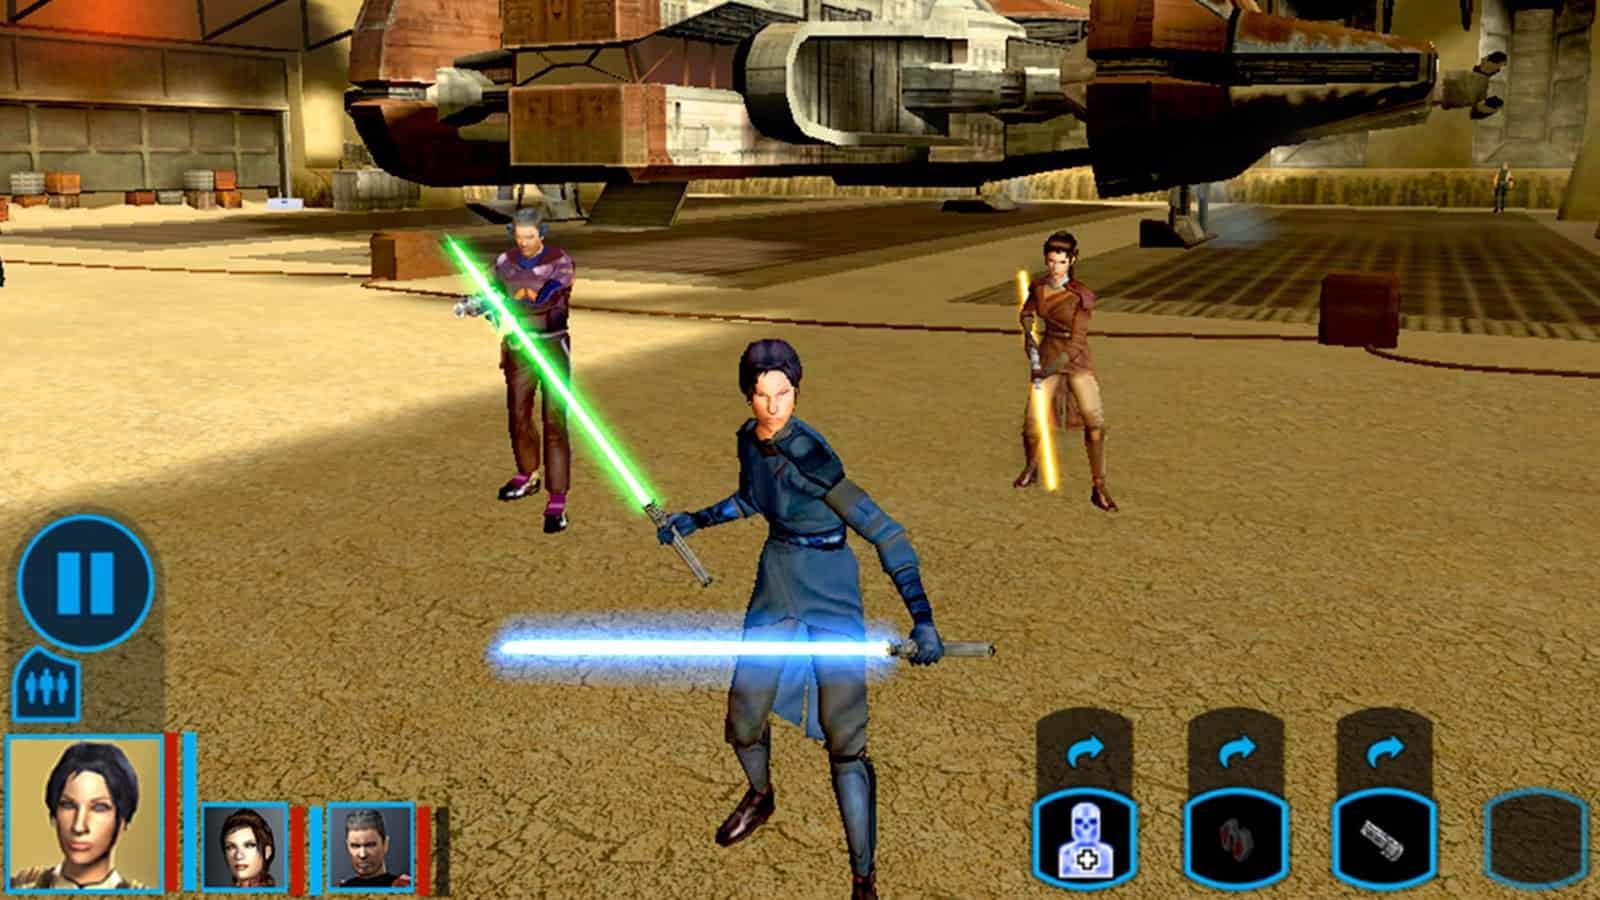 Star Wars jogos